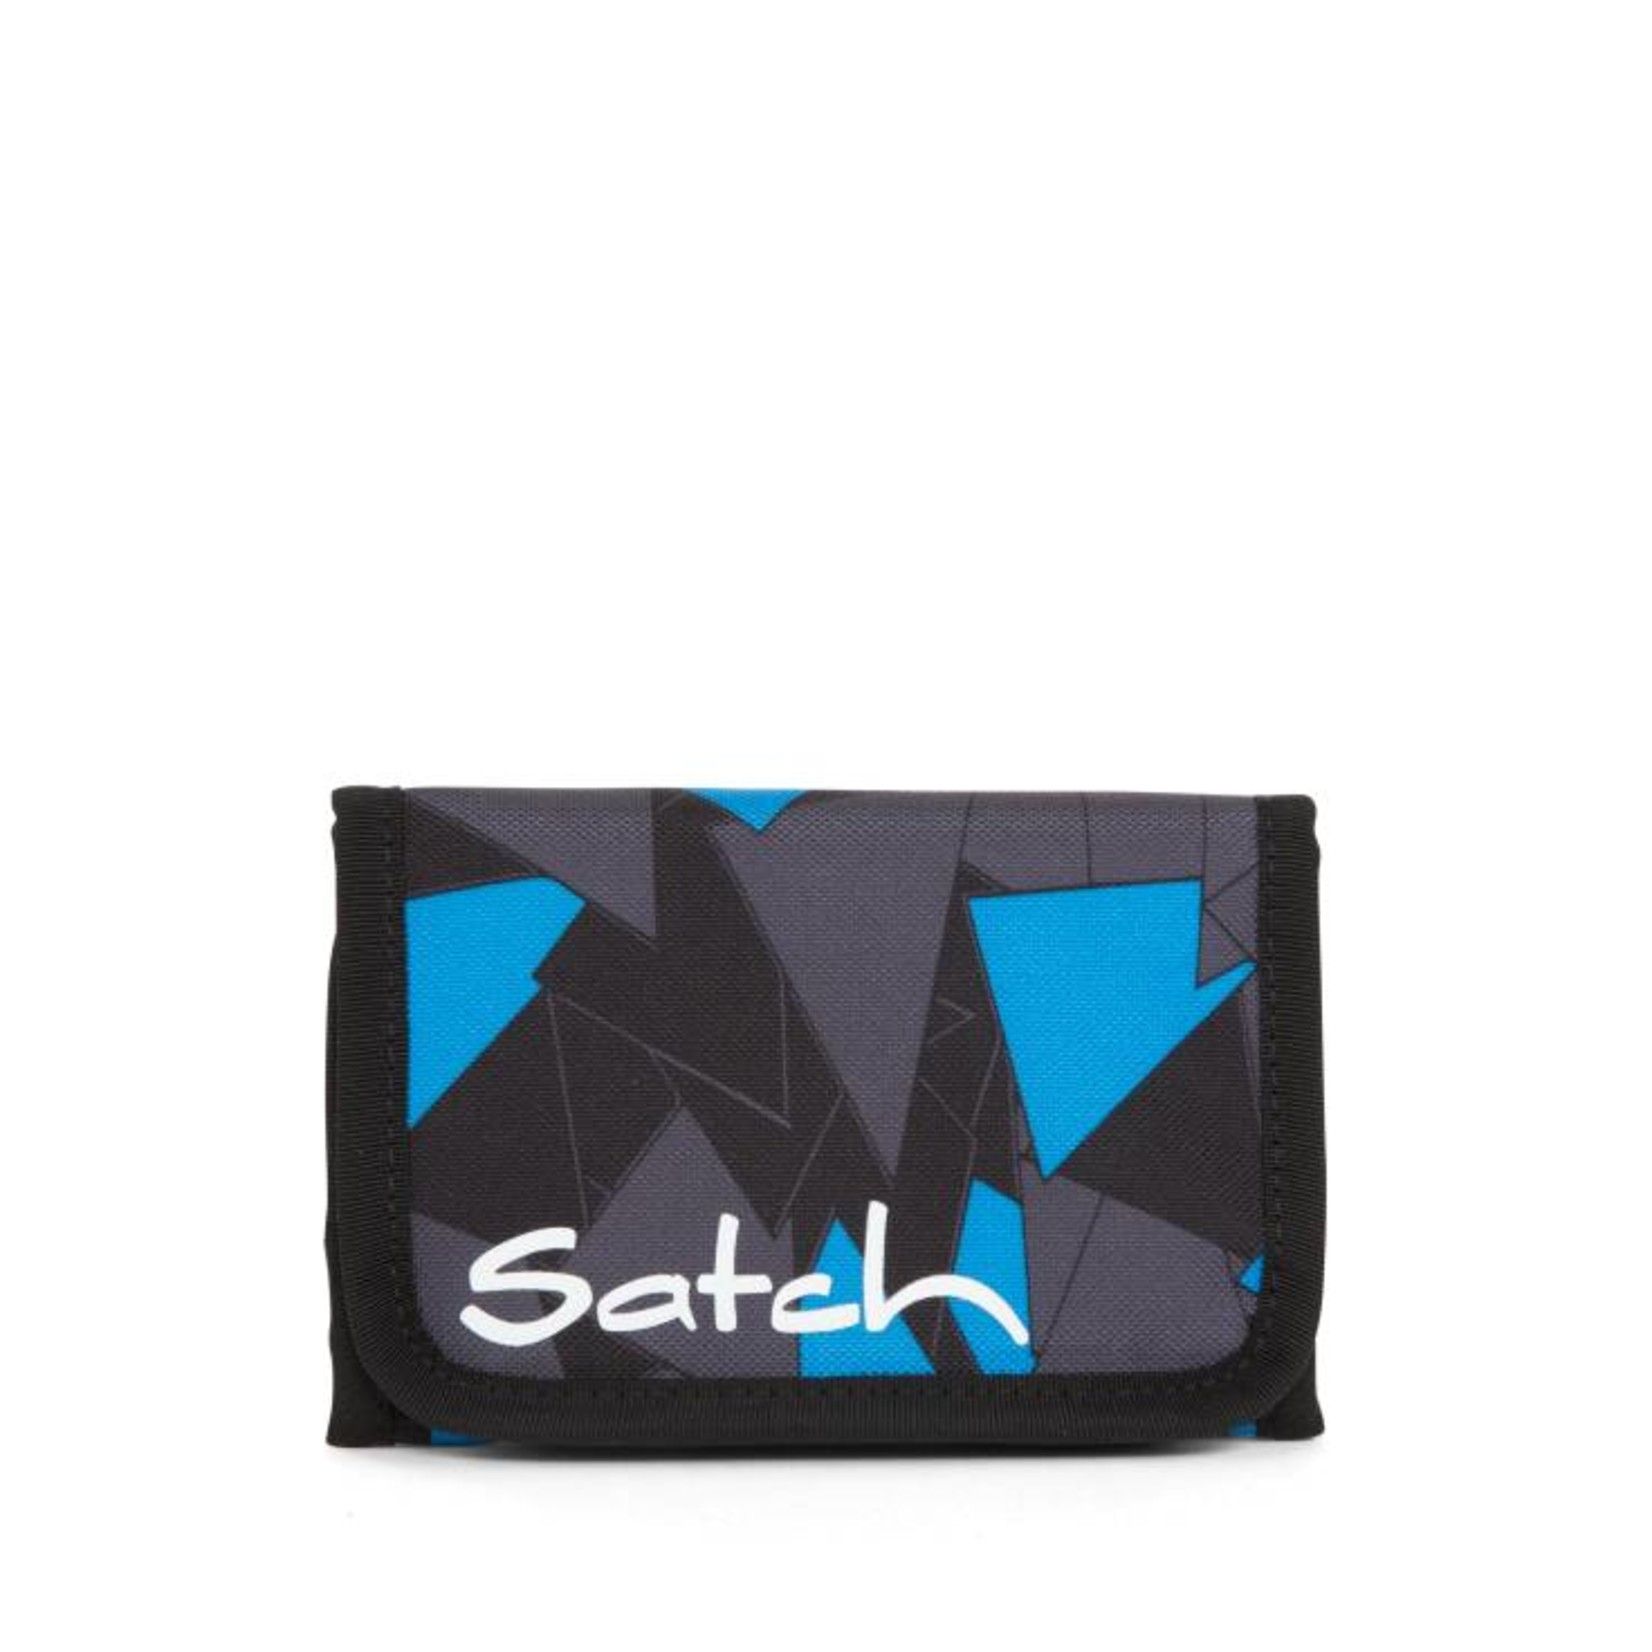 SATCH SATCH Portemonnaie Blue Triangle dreiecke blau 17